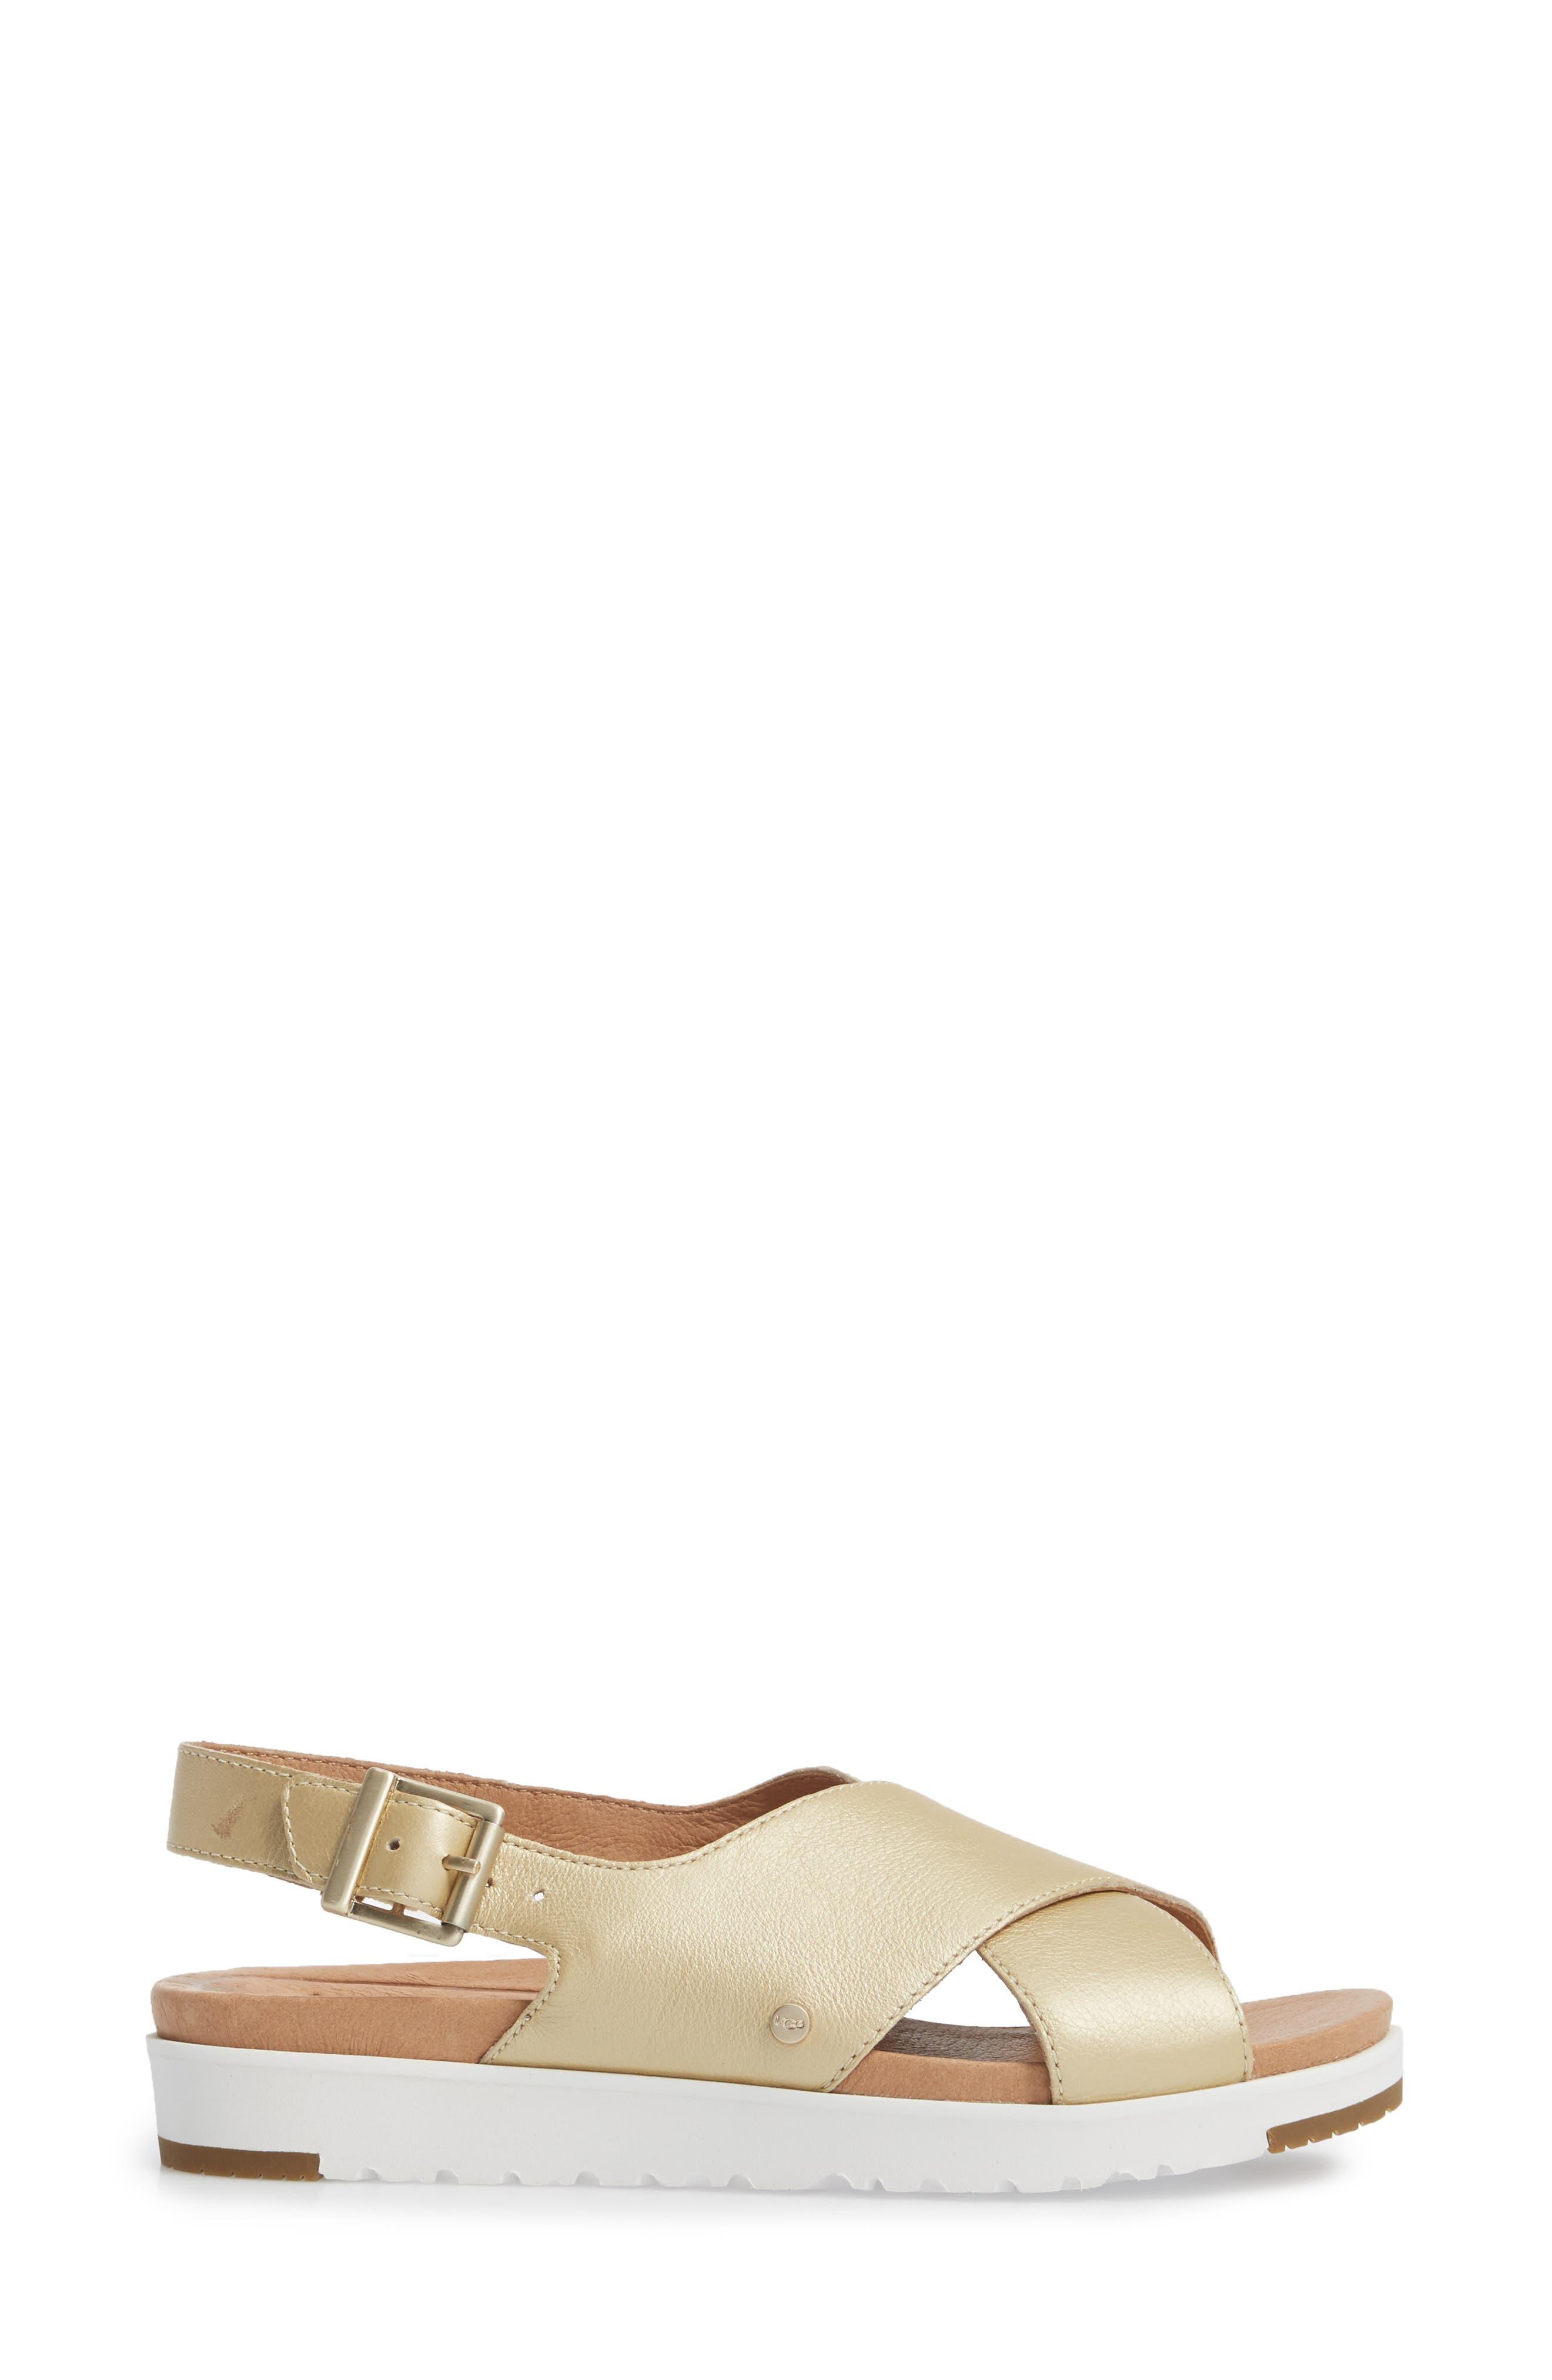 Kamile Slingback Sandal,                             Alternate thumbnail 3, color,                             Gold Leather